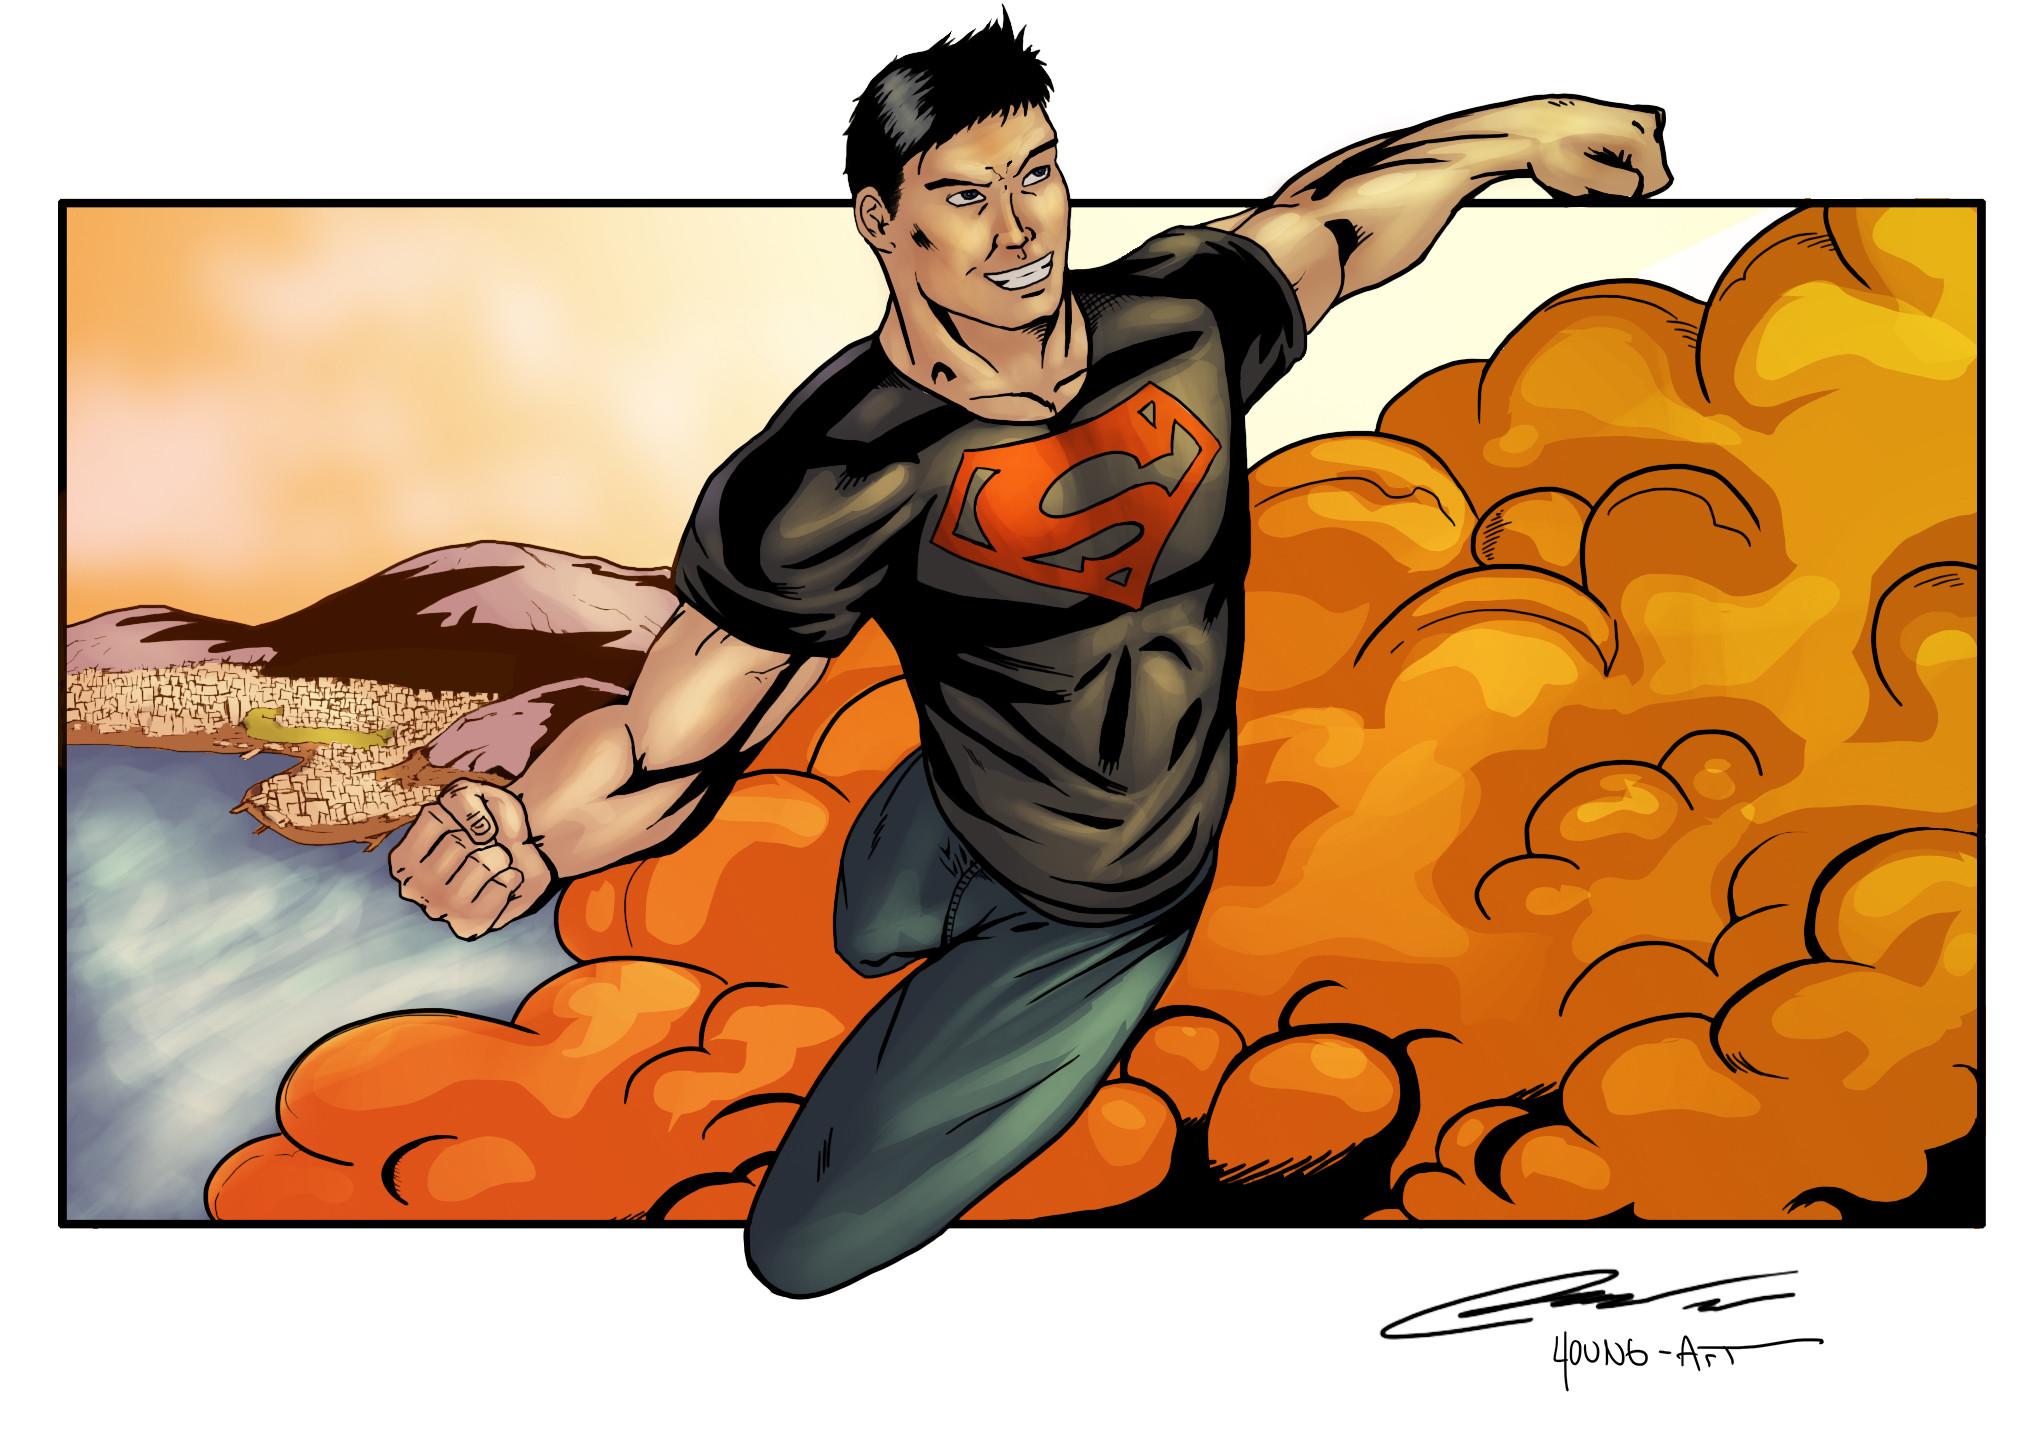 Res: 2034x1438, Superboy Wallpaper Images TheCelebrityPix